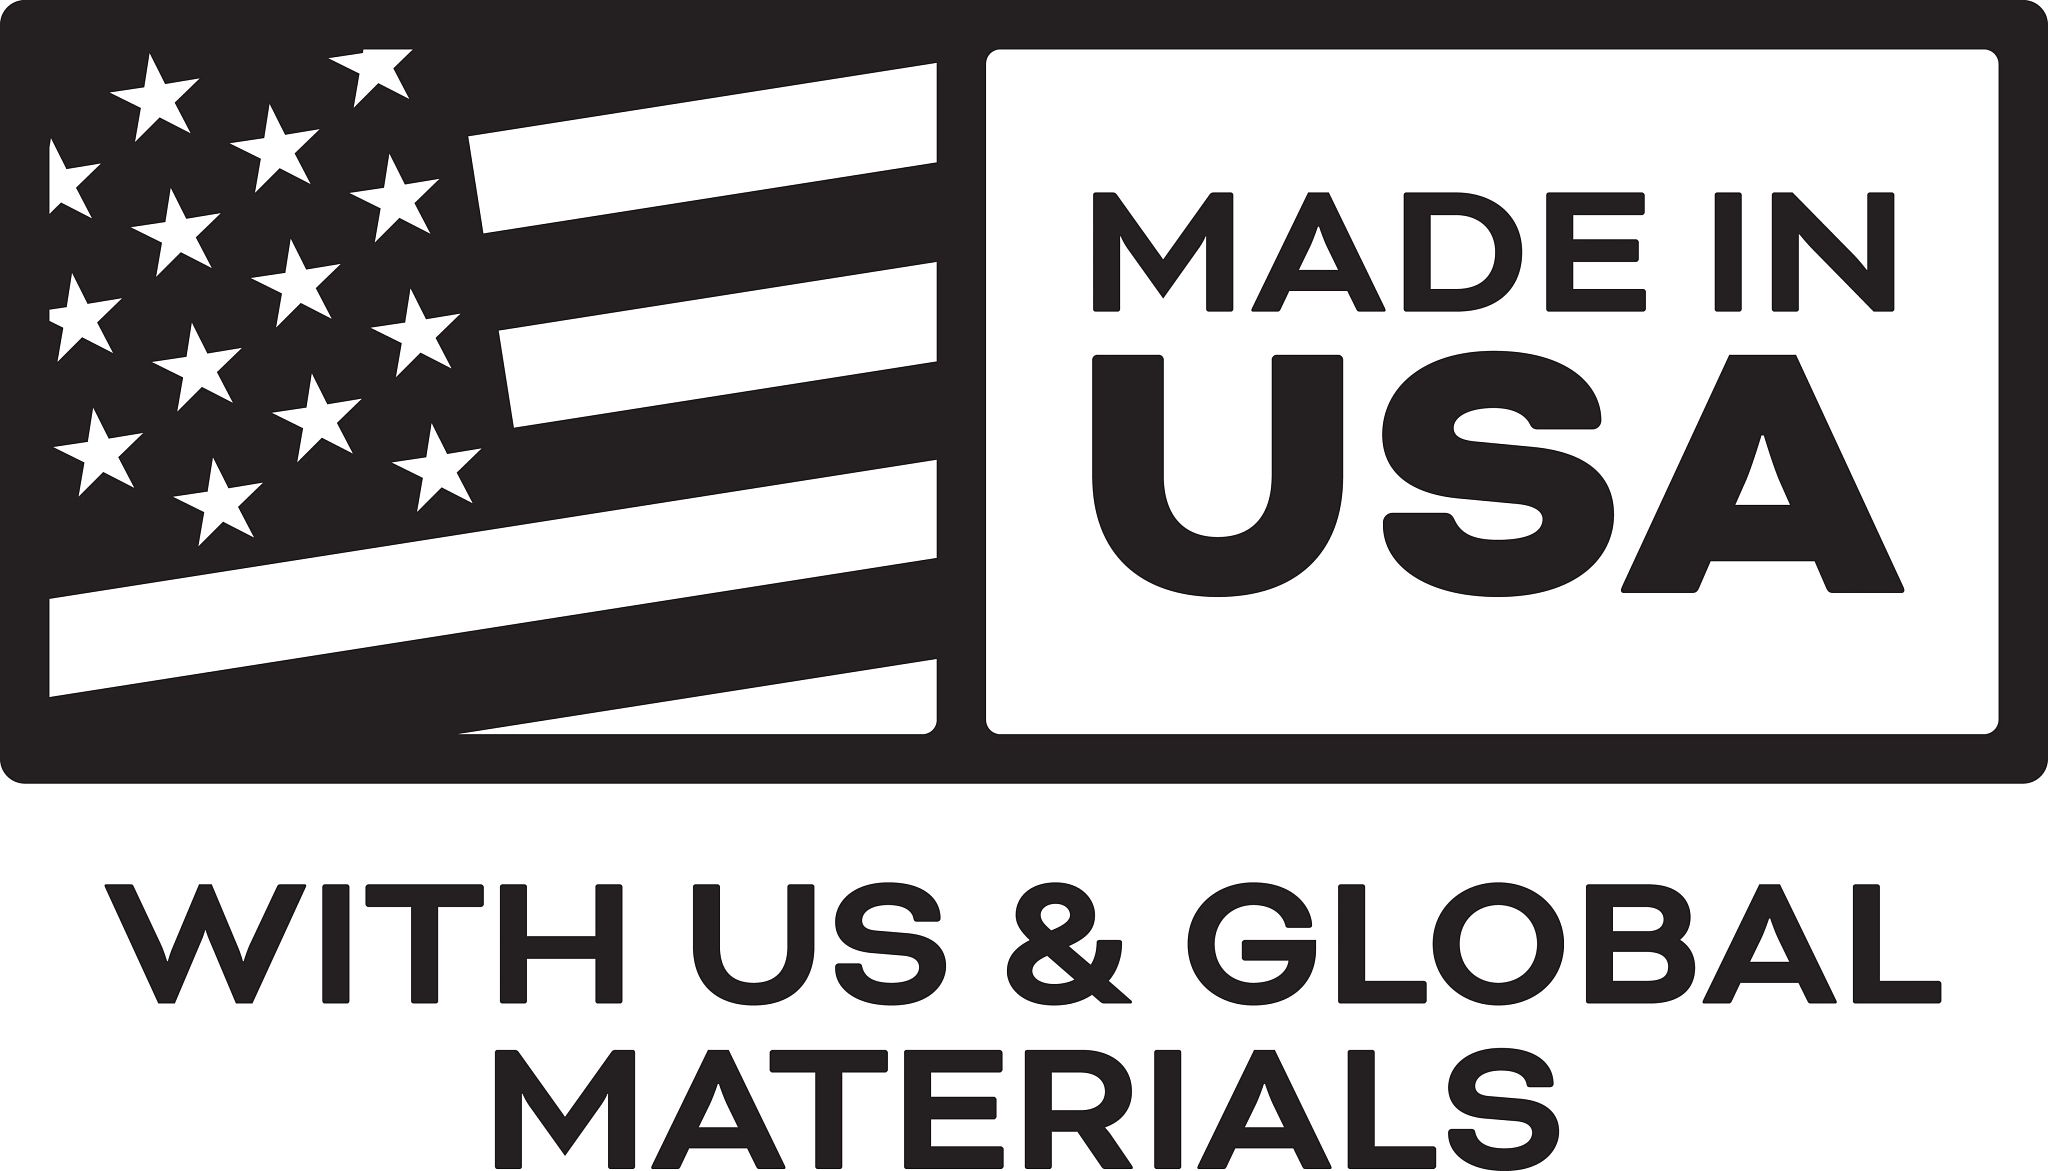 FS_MadeInTheUSA_Flag_USGlobalMaterials_Black.eps